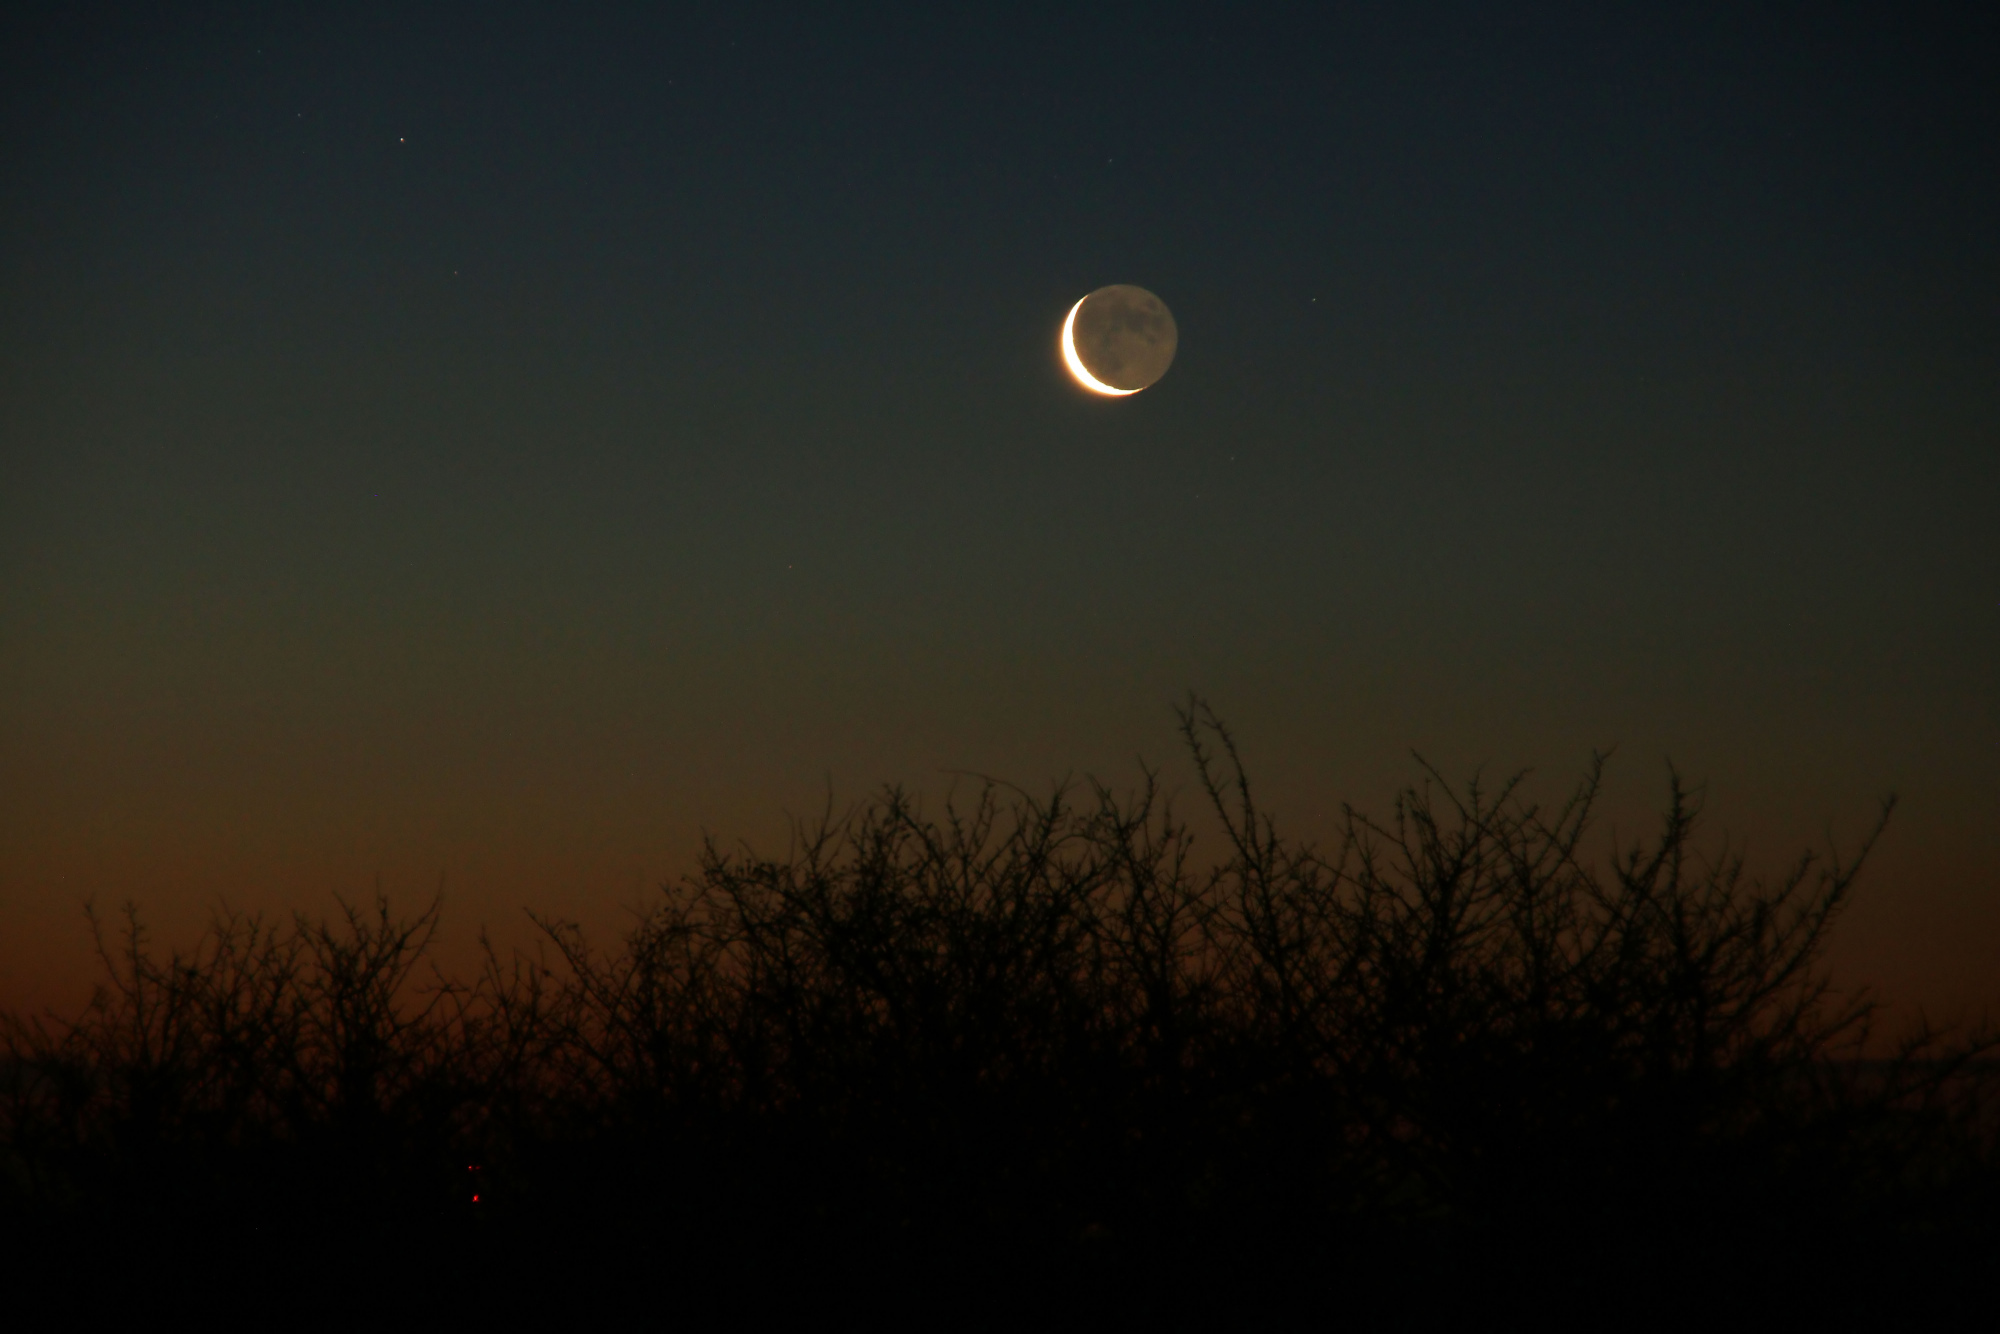 3 a Lune cendrée 1158B1N1 send.jpg